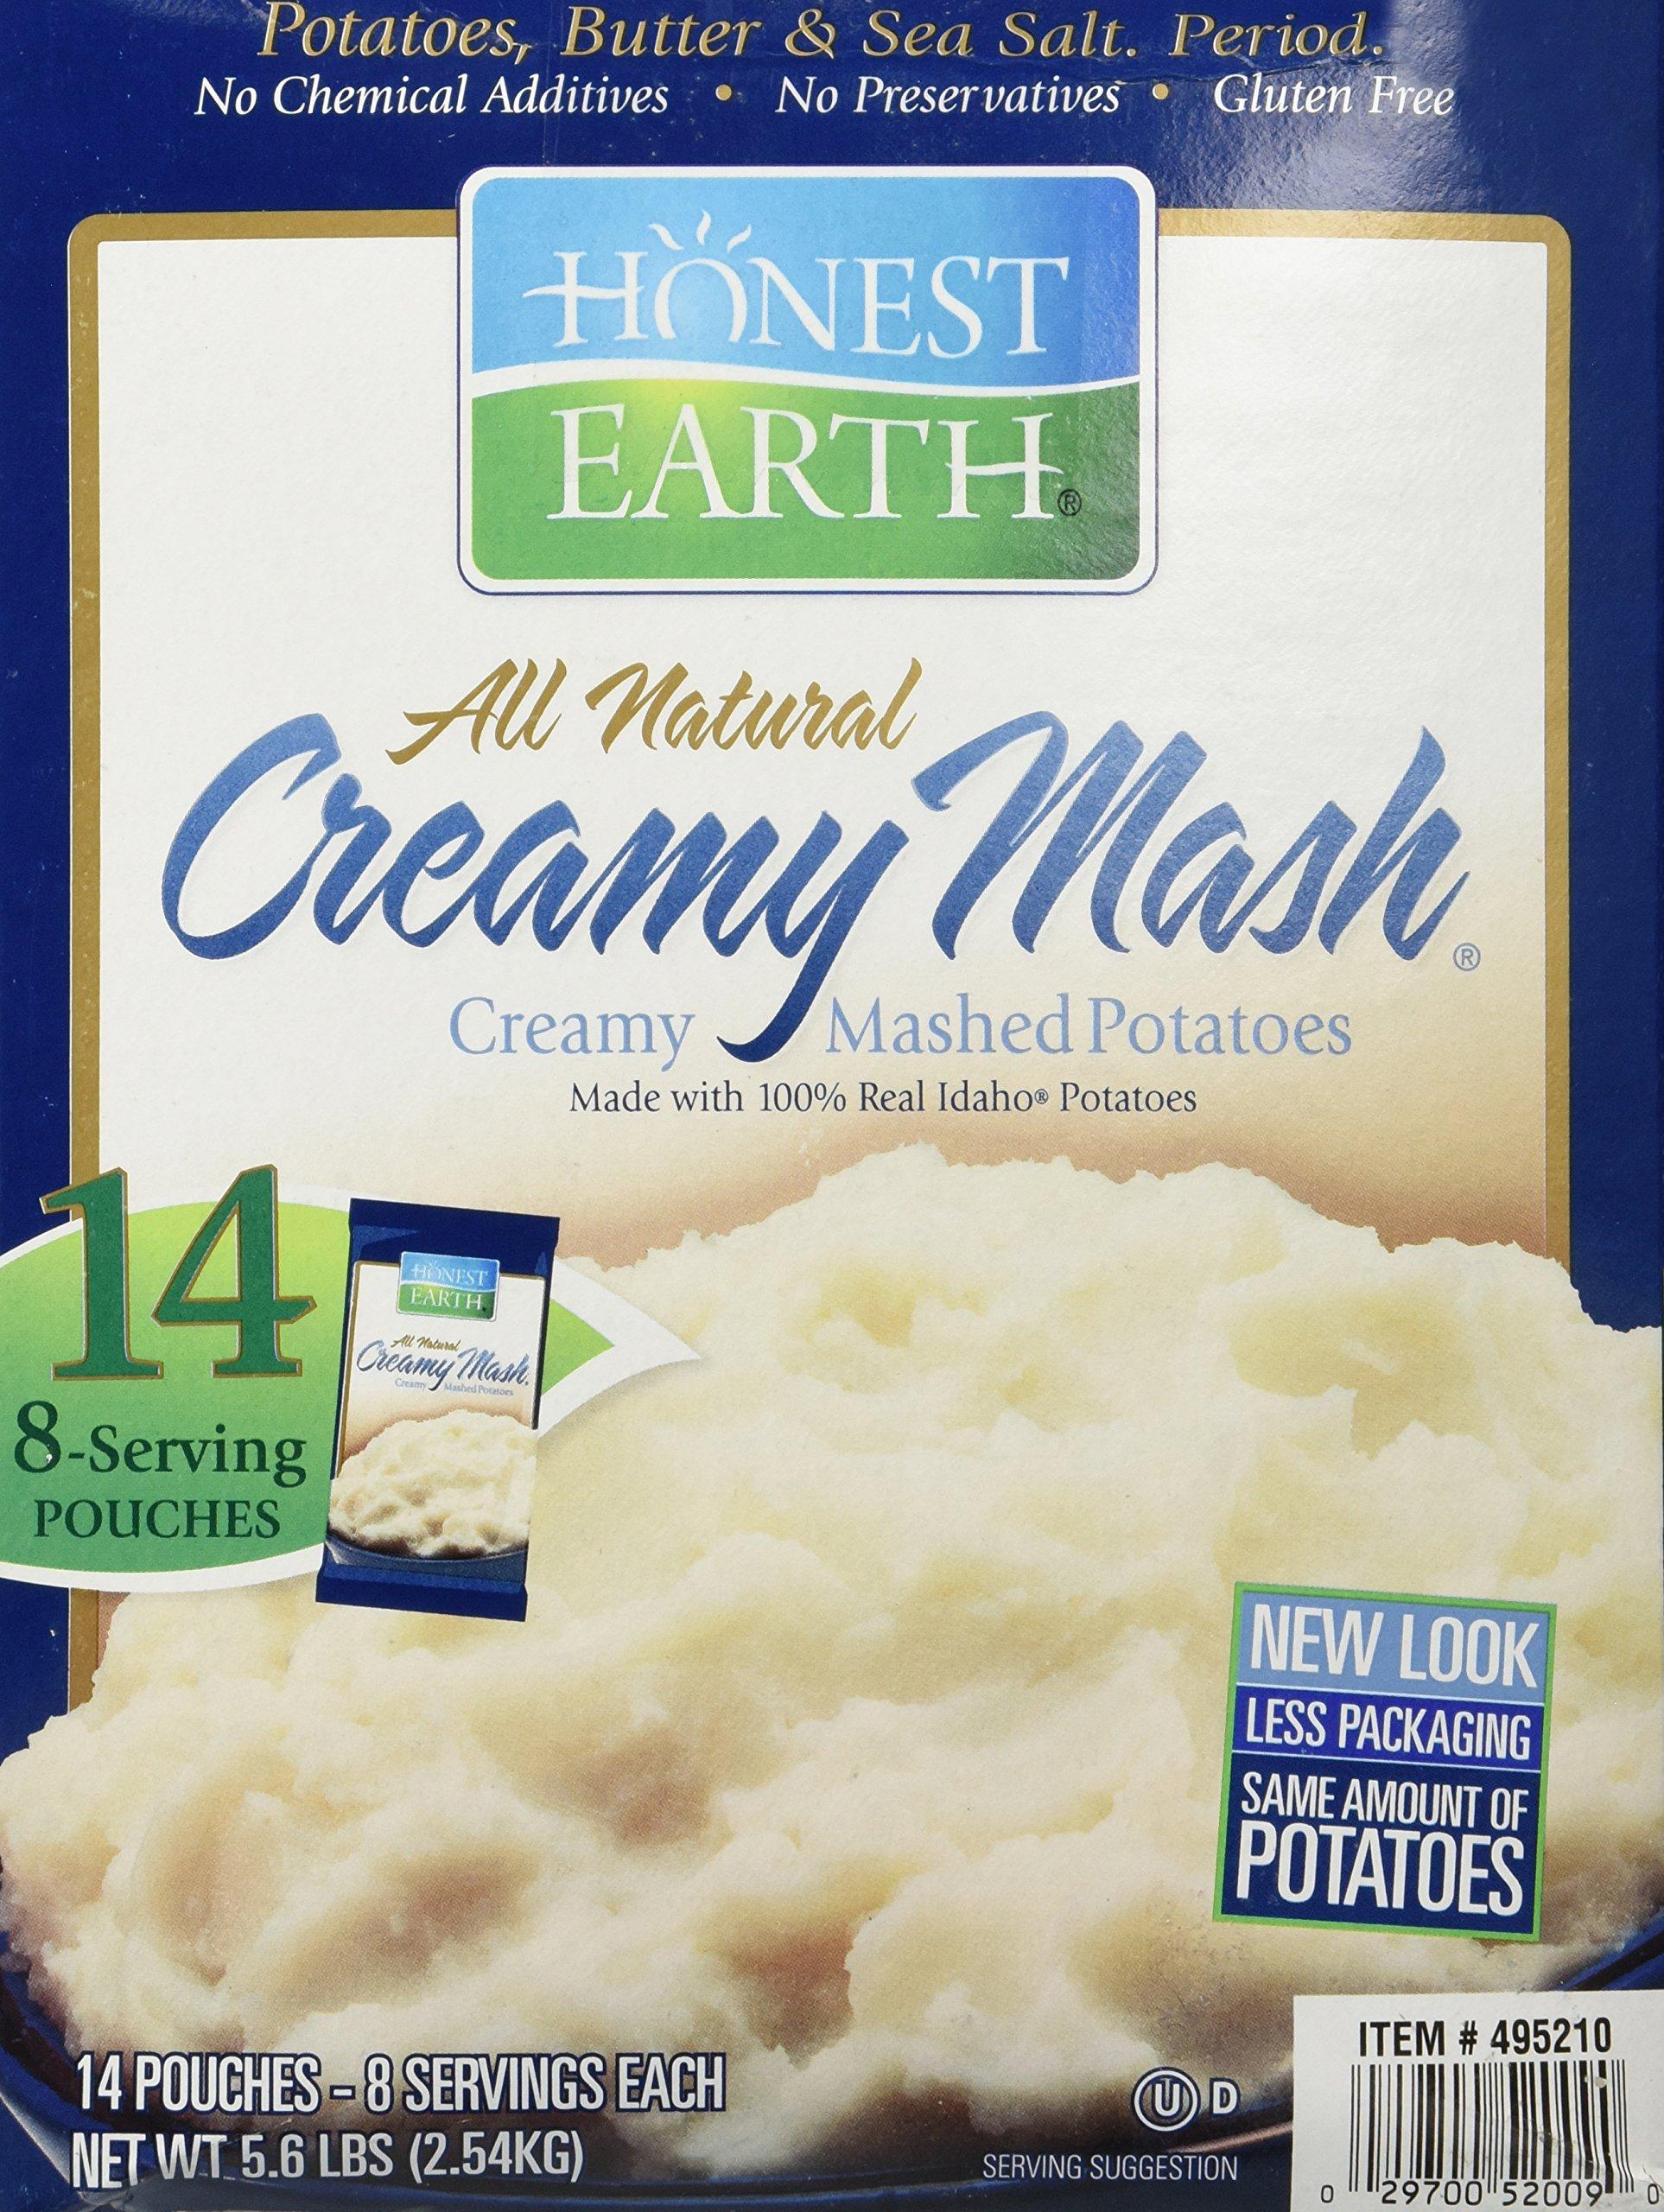 Honest Earth Creamy Mashed Potatoes Dry Mashed Potatoes 25kg 181g